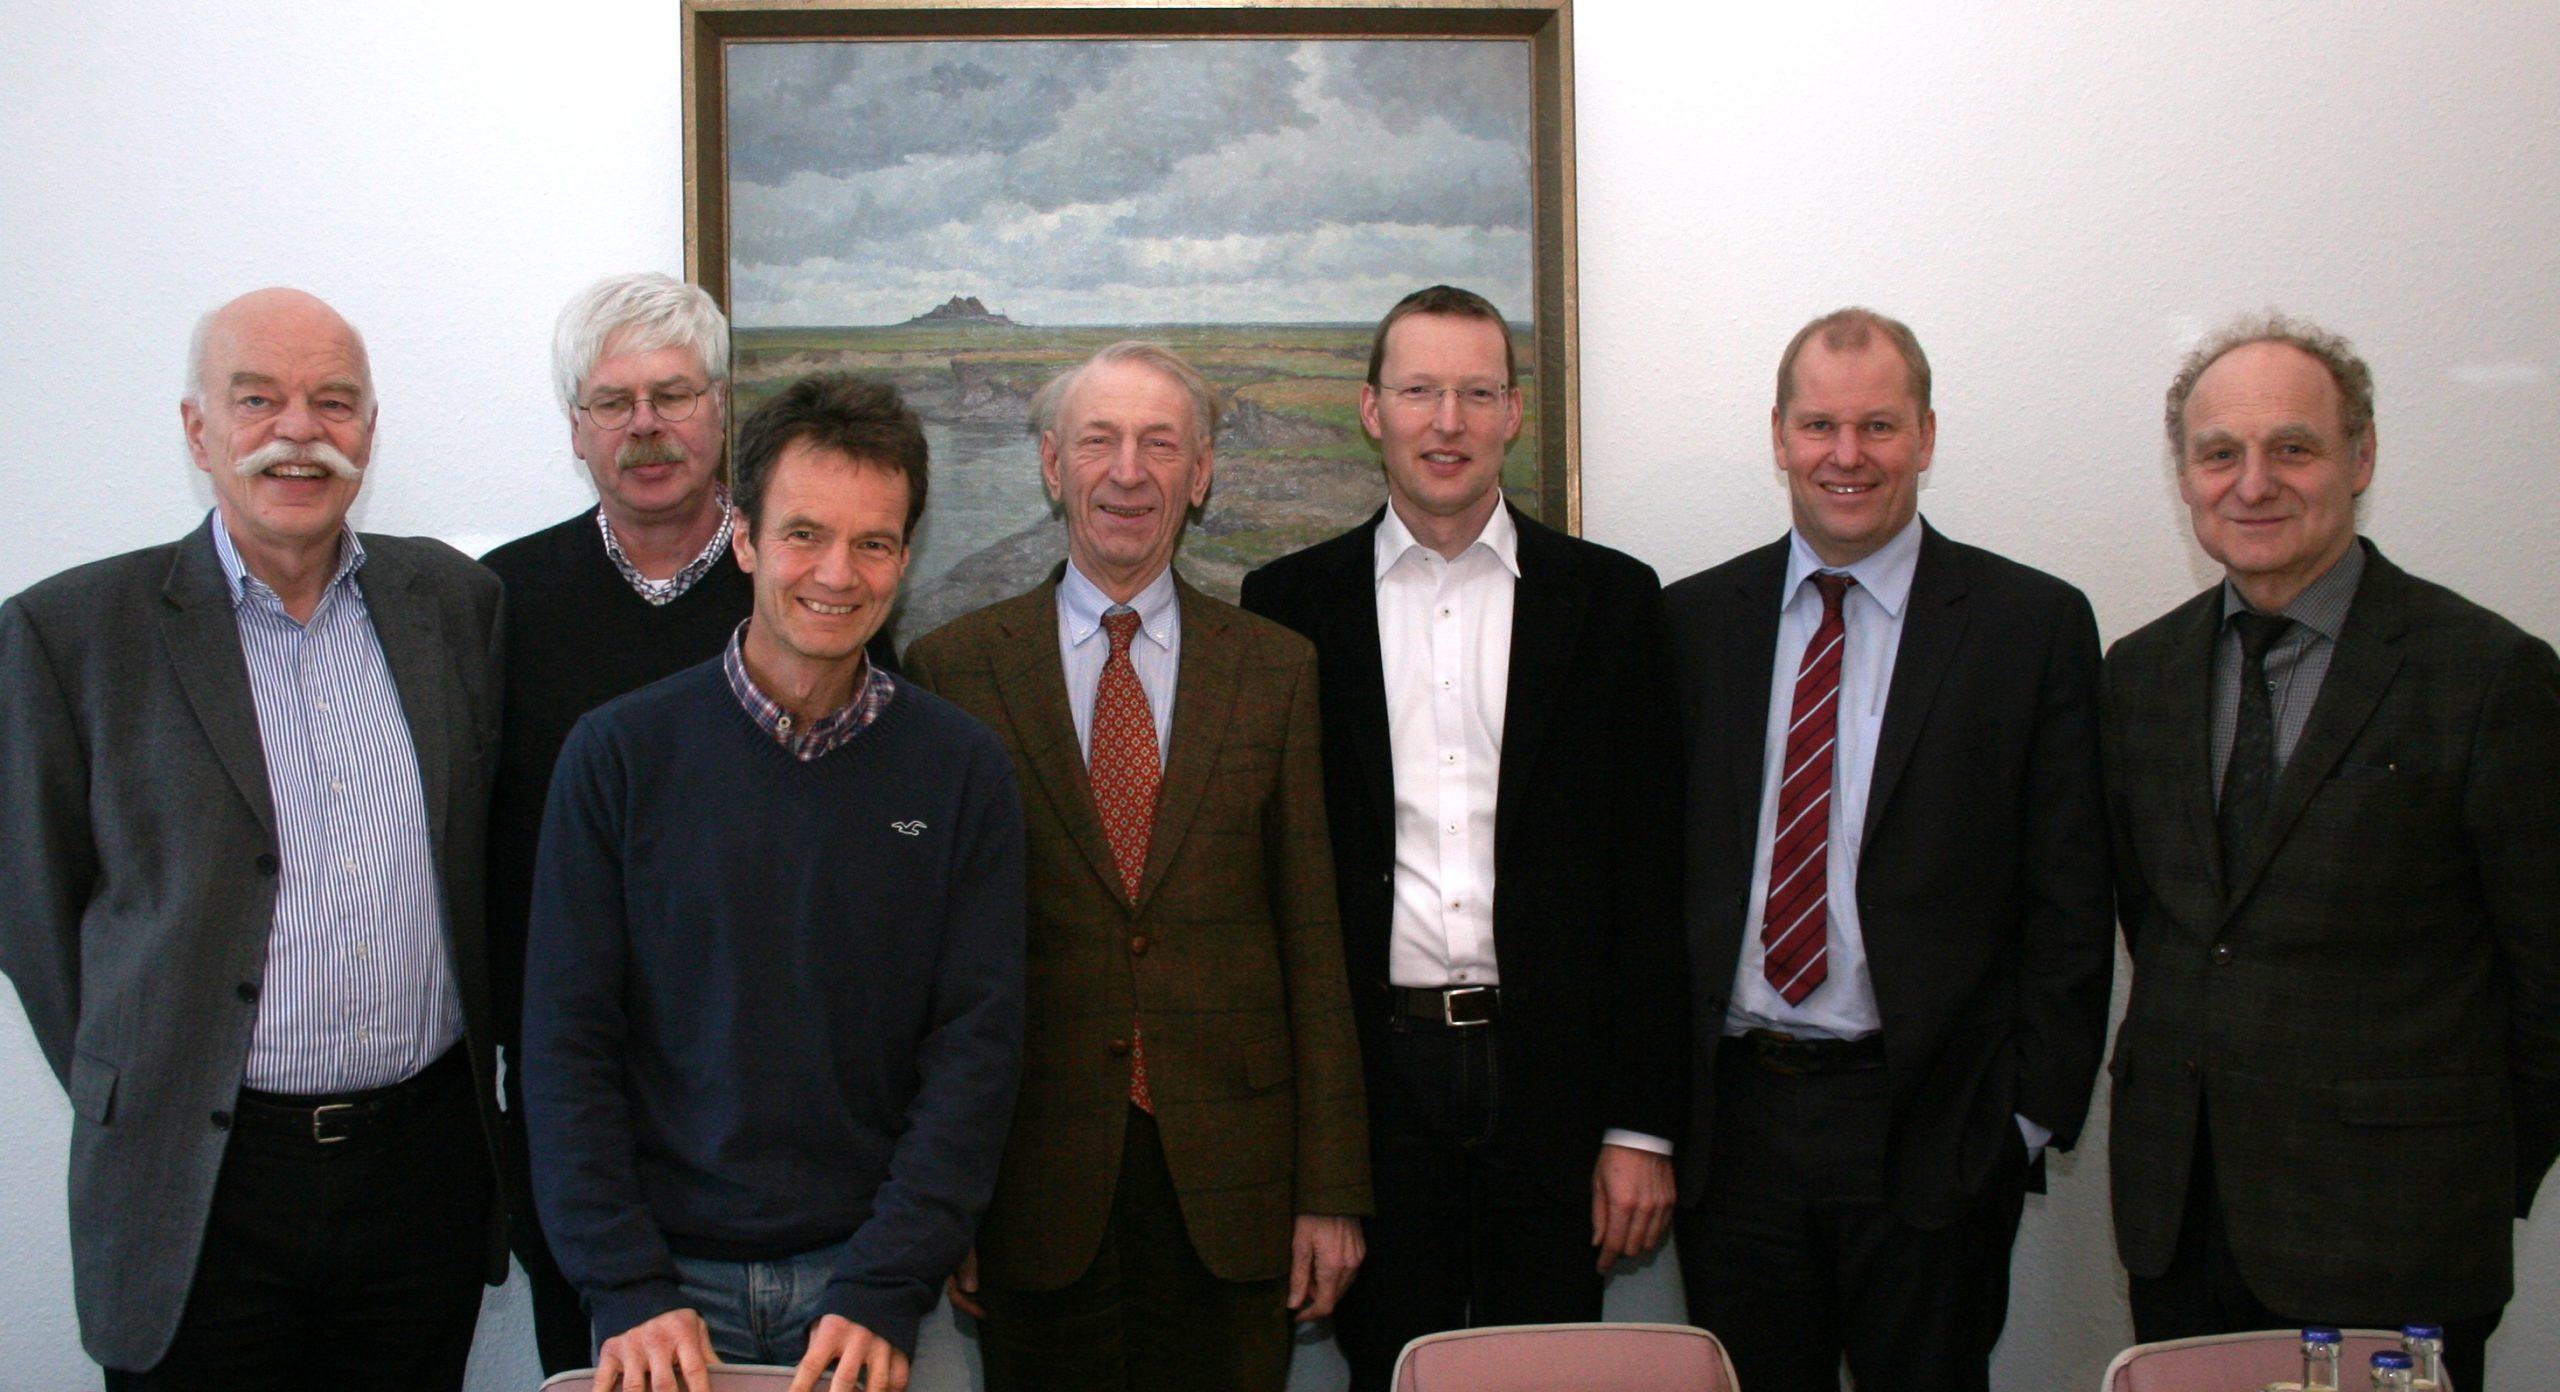 Historiker im Nordfriisk Instituut scaled